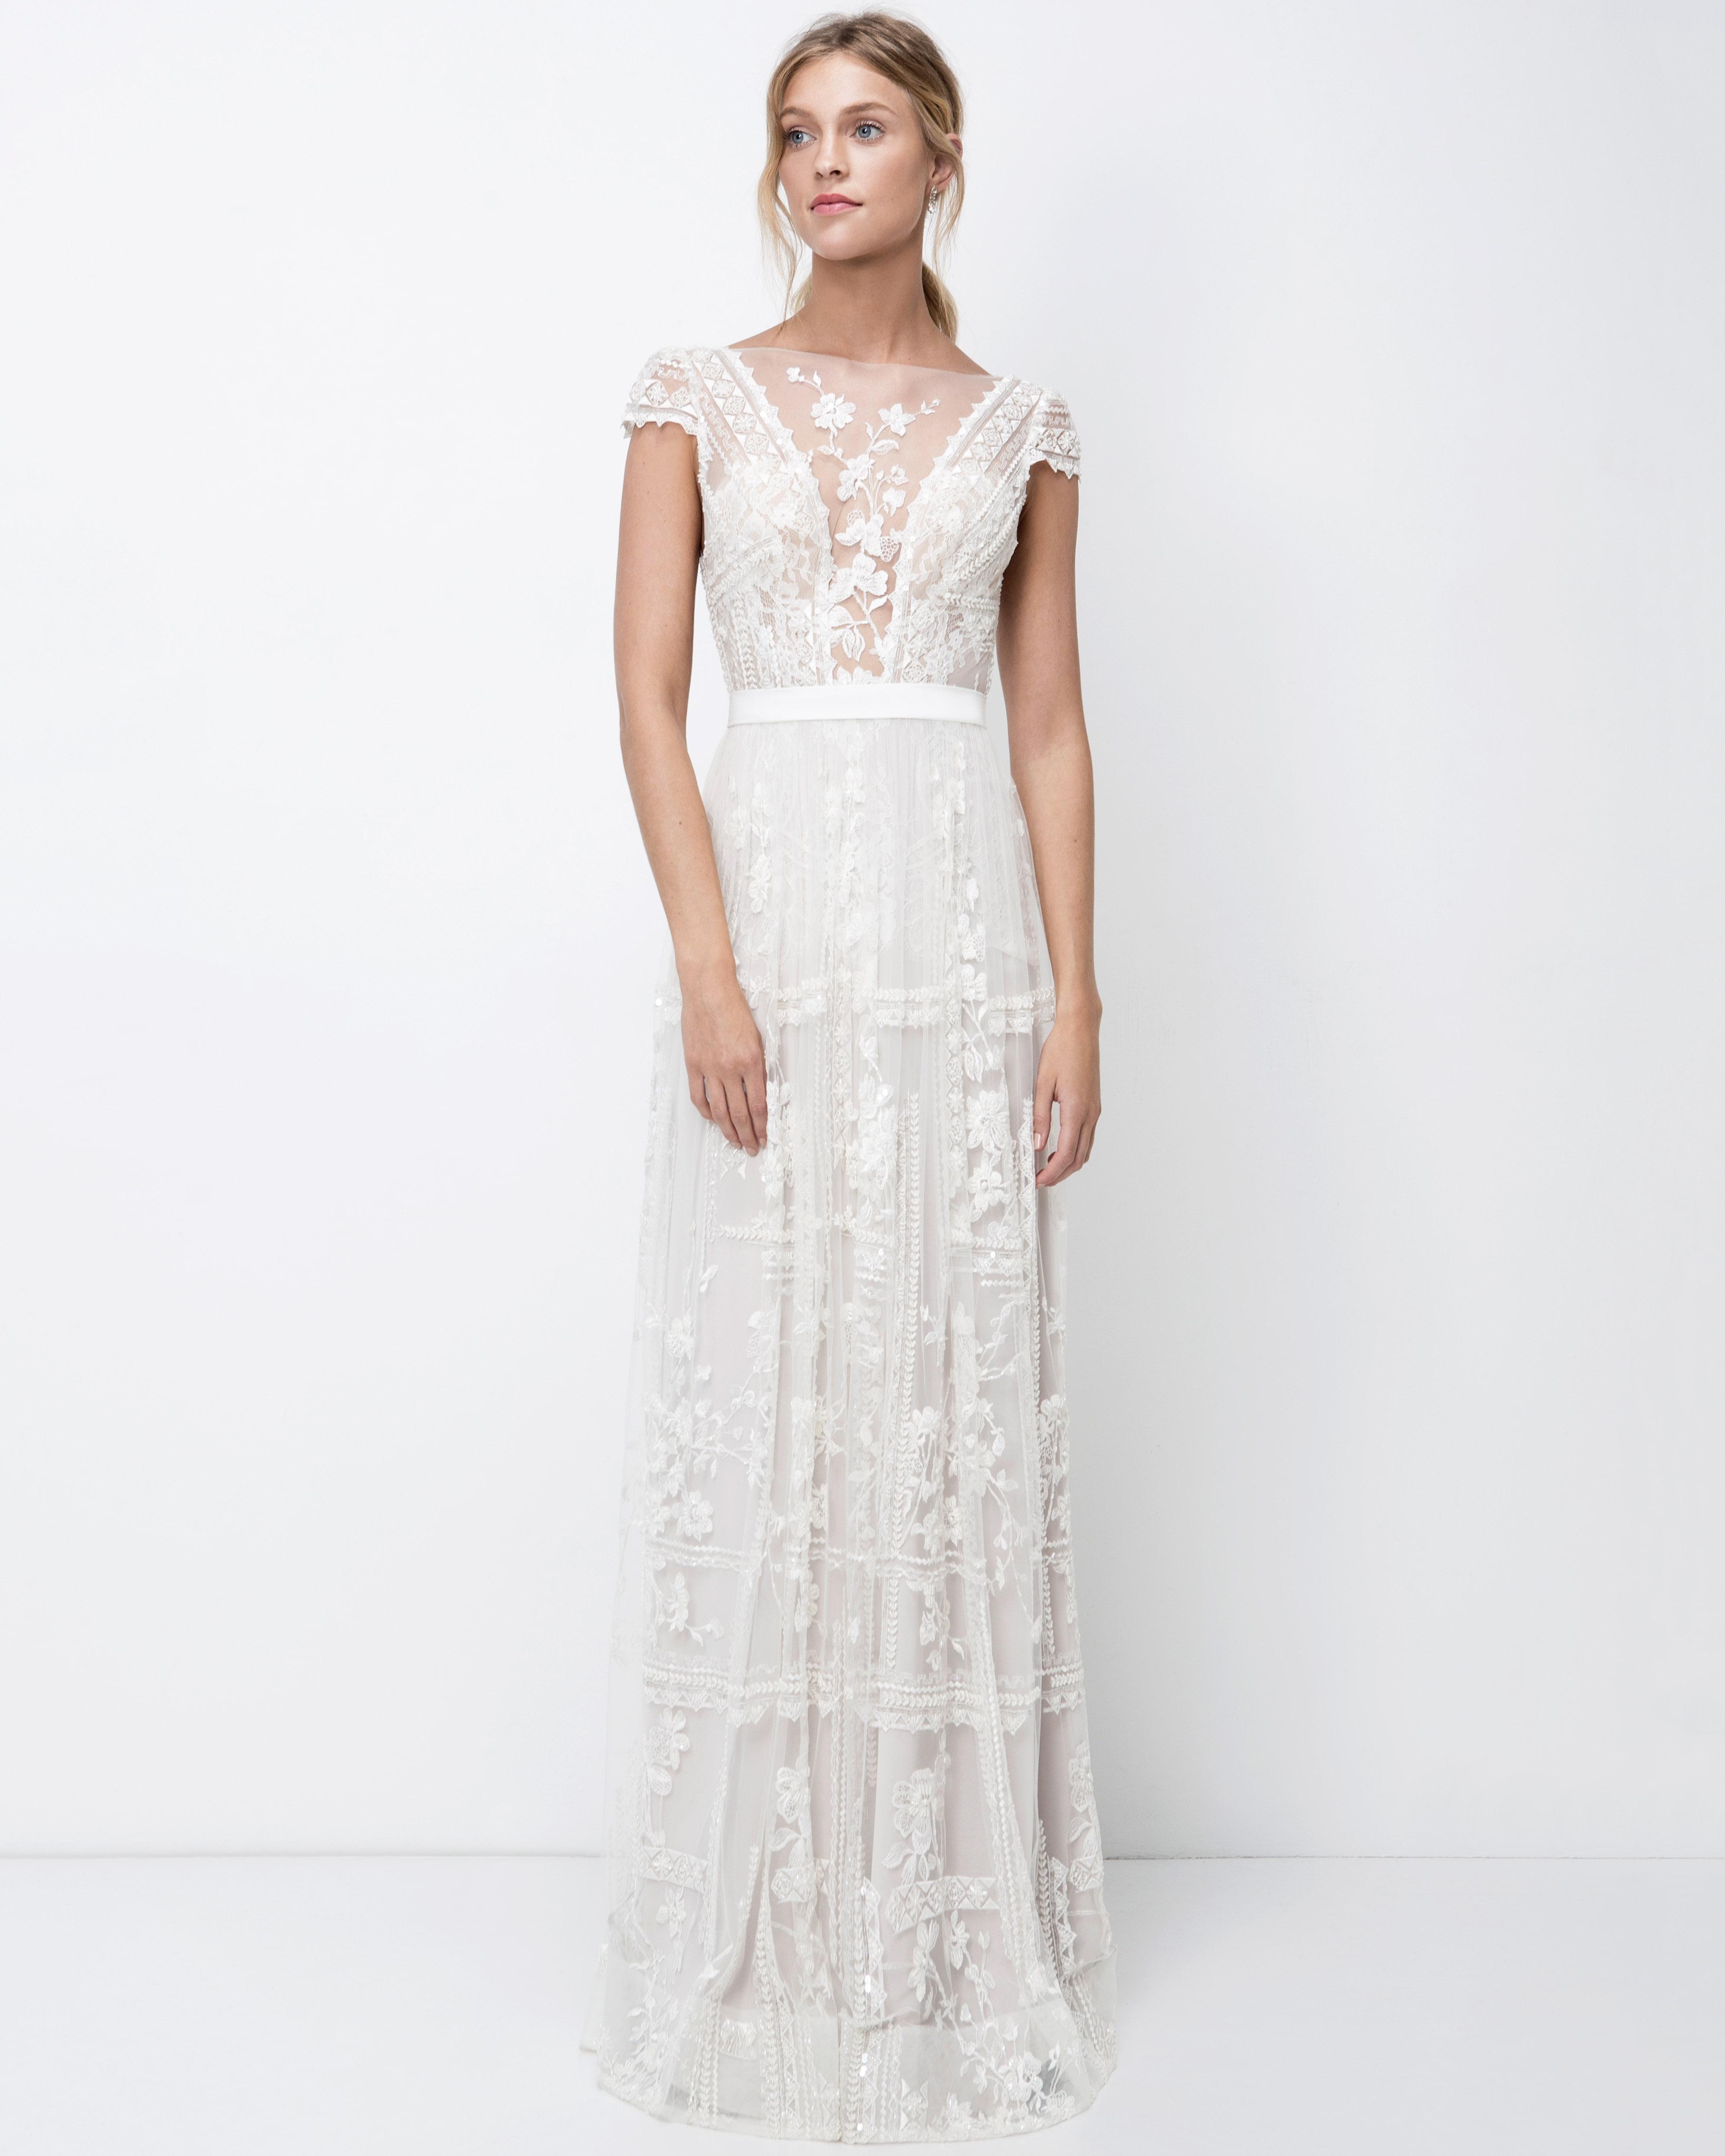 lihi hod sheath high neckline wedding dress with cap sleeves fall 2018